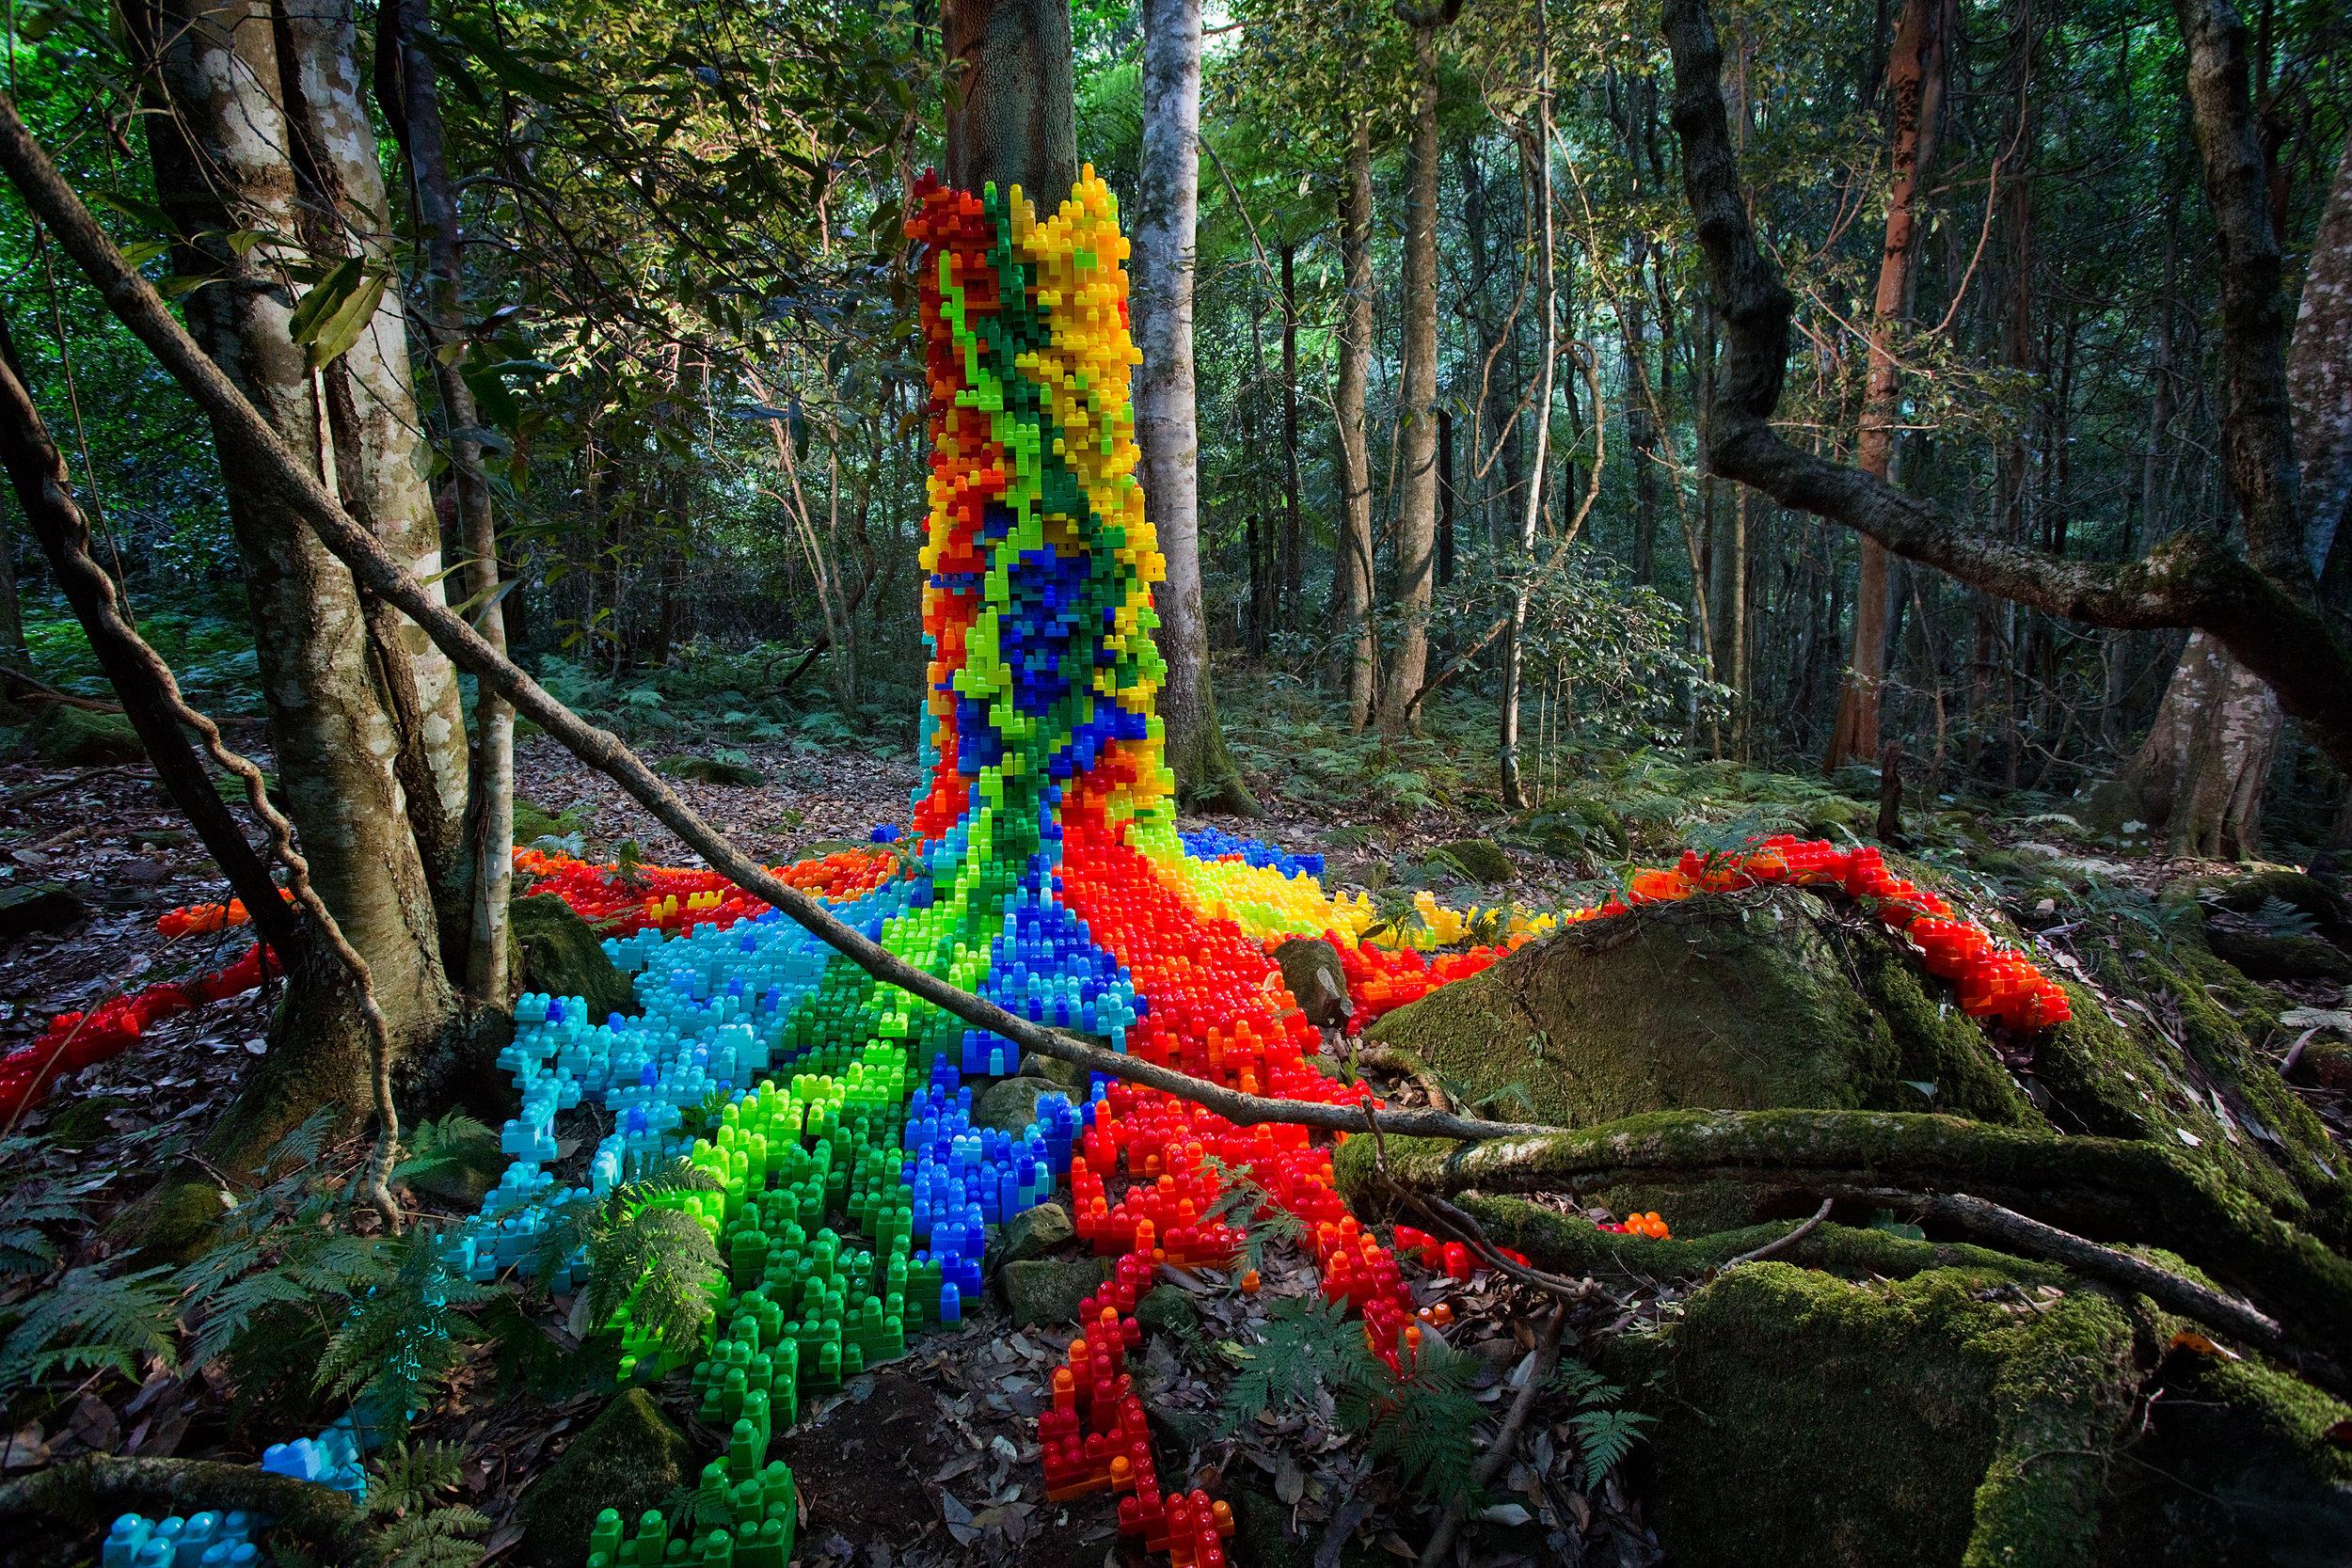 Rochelle Quantock,  Choking Hazard , 2018, installation view, 'Sculpture at Scenic World 2018', Katoomba; image courtesy Scenic World